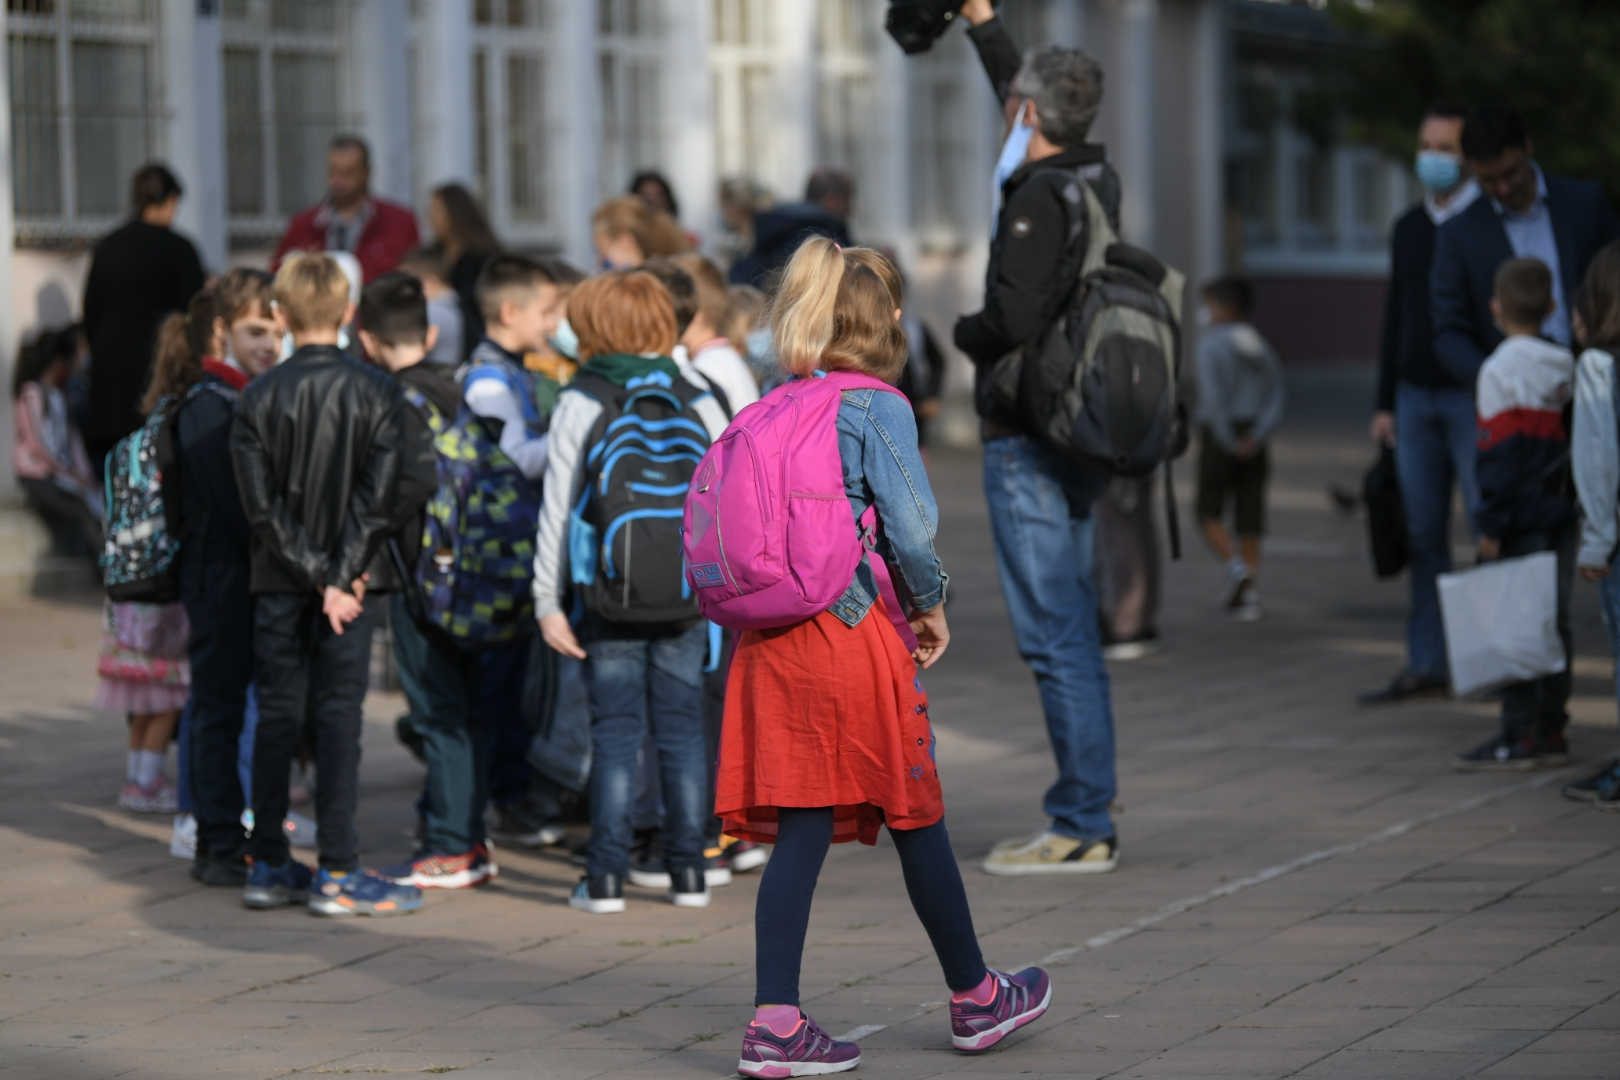 Prvi dan škole, 1. septembar FOTO: Dragan Mujan / Nova.rs